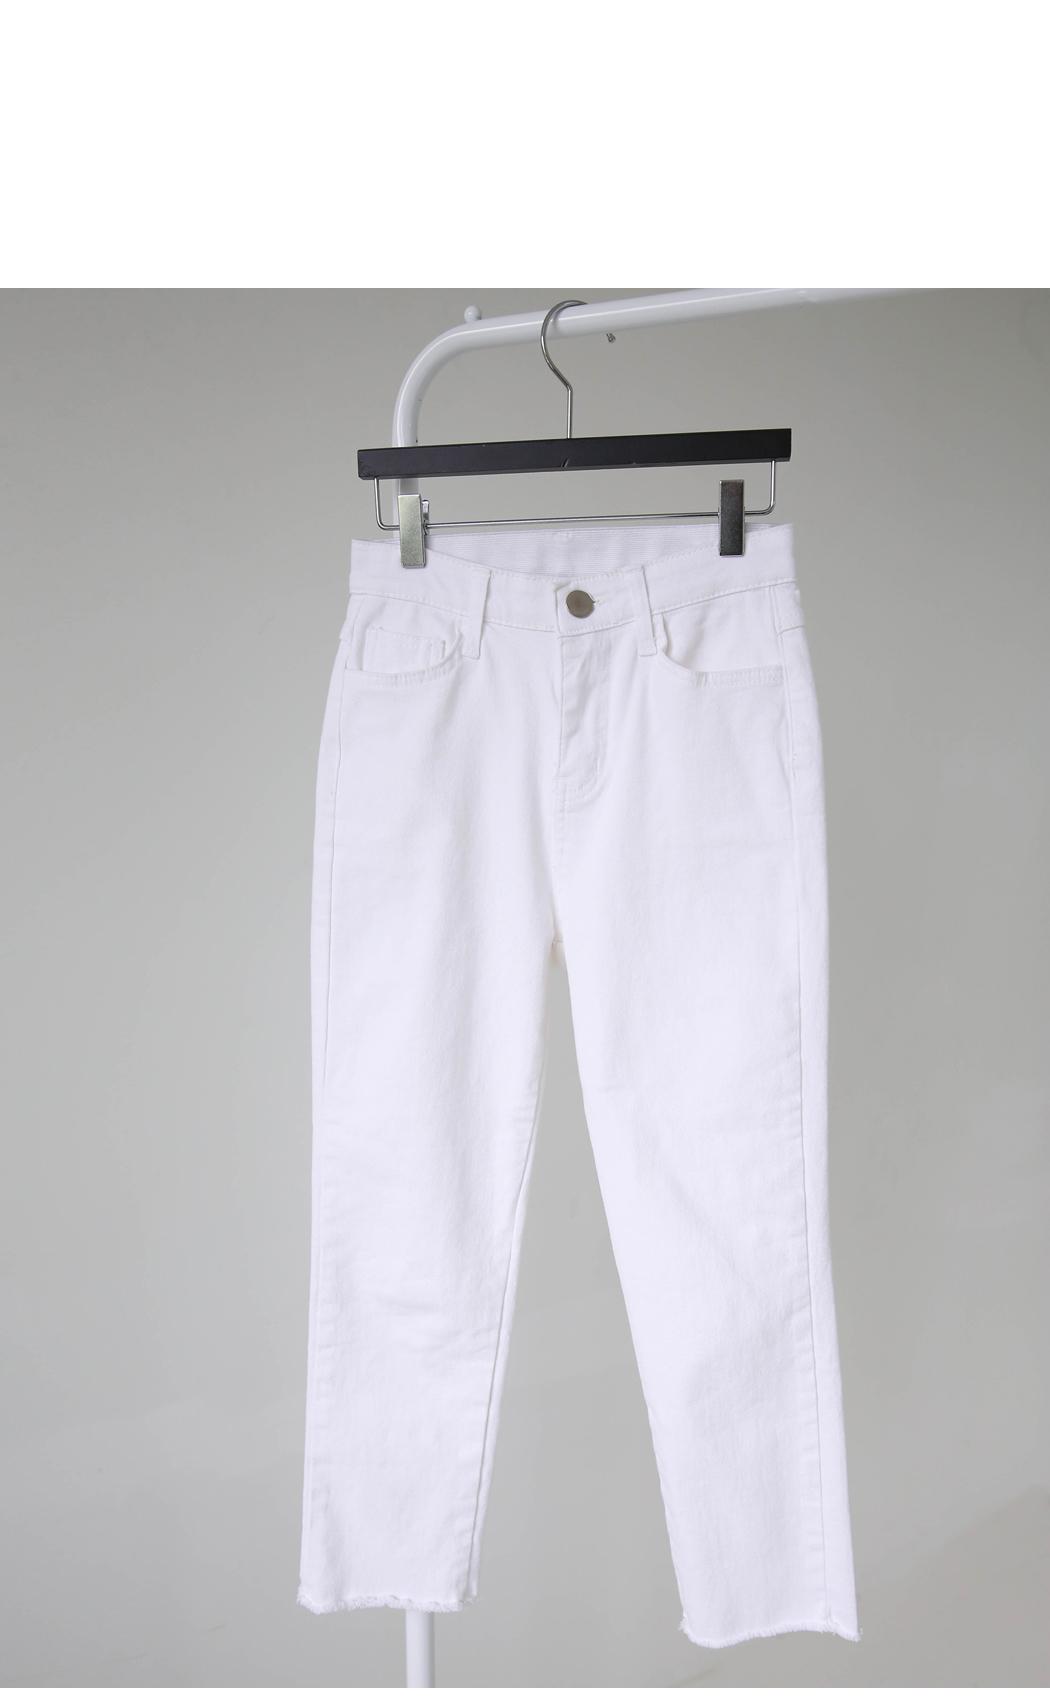 Peanut White 8 cropped pants